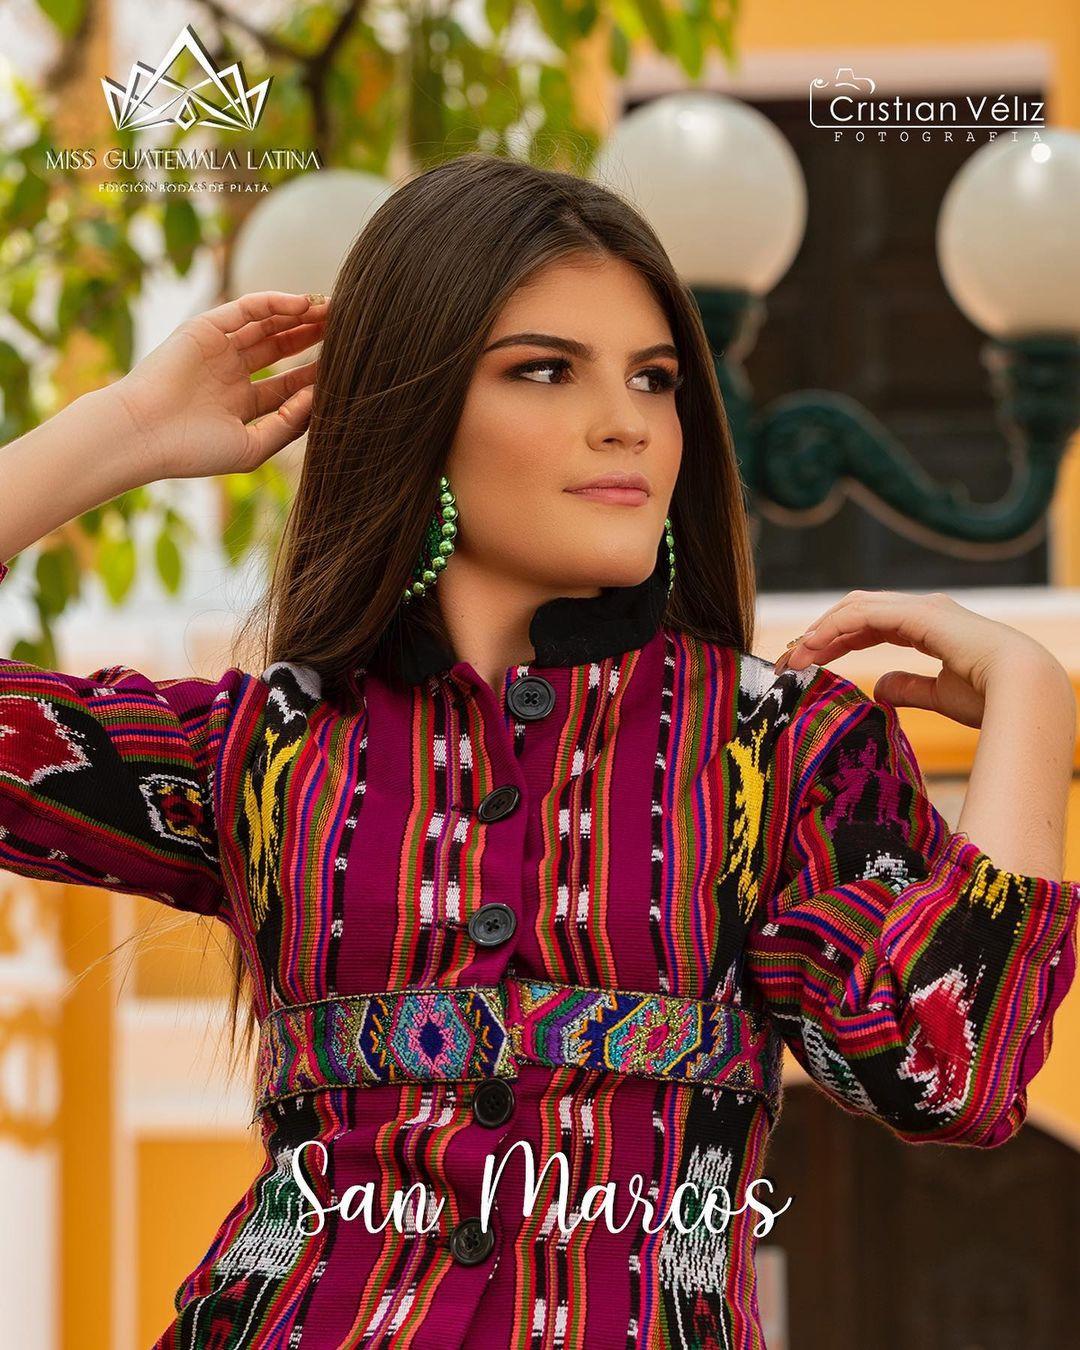 candidatas a miss guatemala latina 2021. final: 30 de abril. - Página 2 B2gt4f